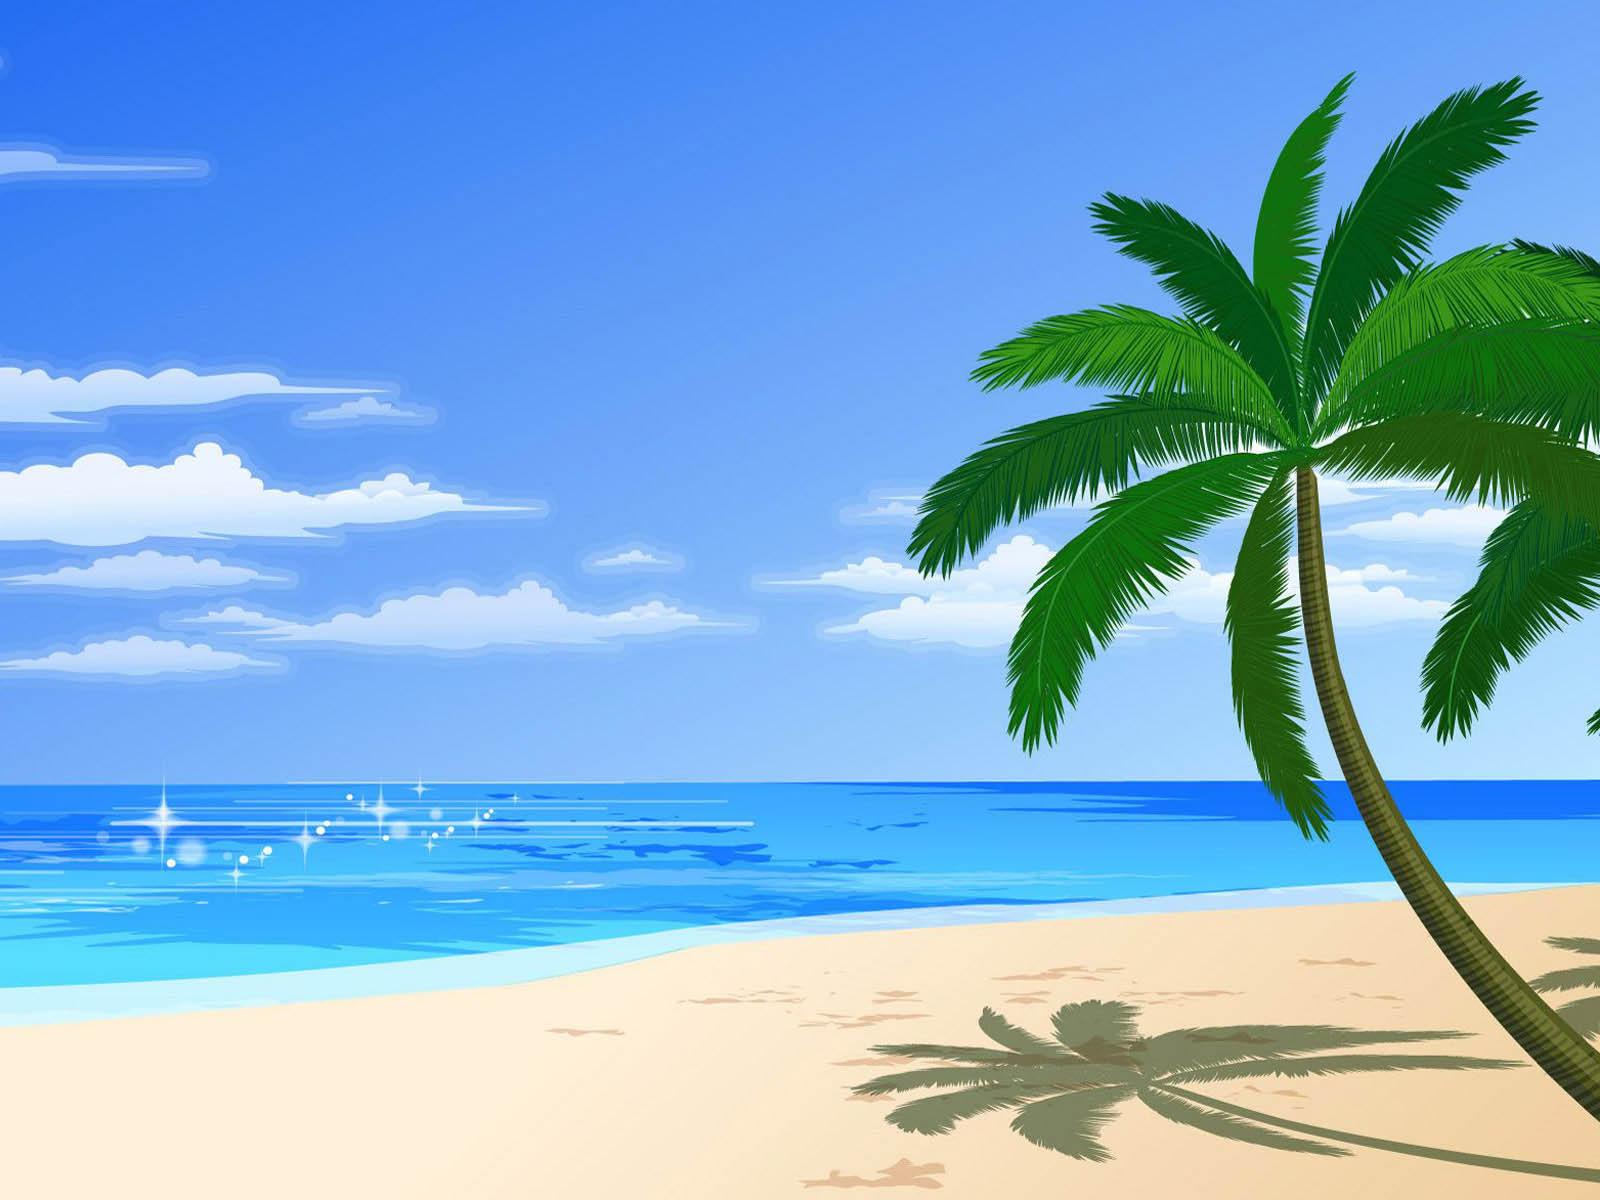 Free clipart beach scenes graphic transparent download Free Tropical Beach Cliparts, Download Free Clip Art, Free Clip Art ... graphic transparent download